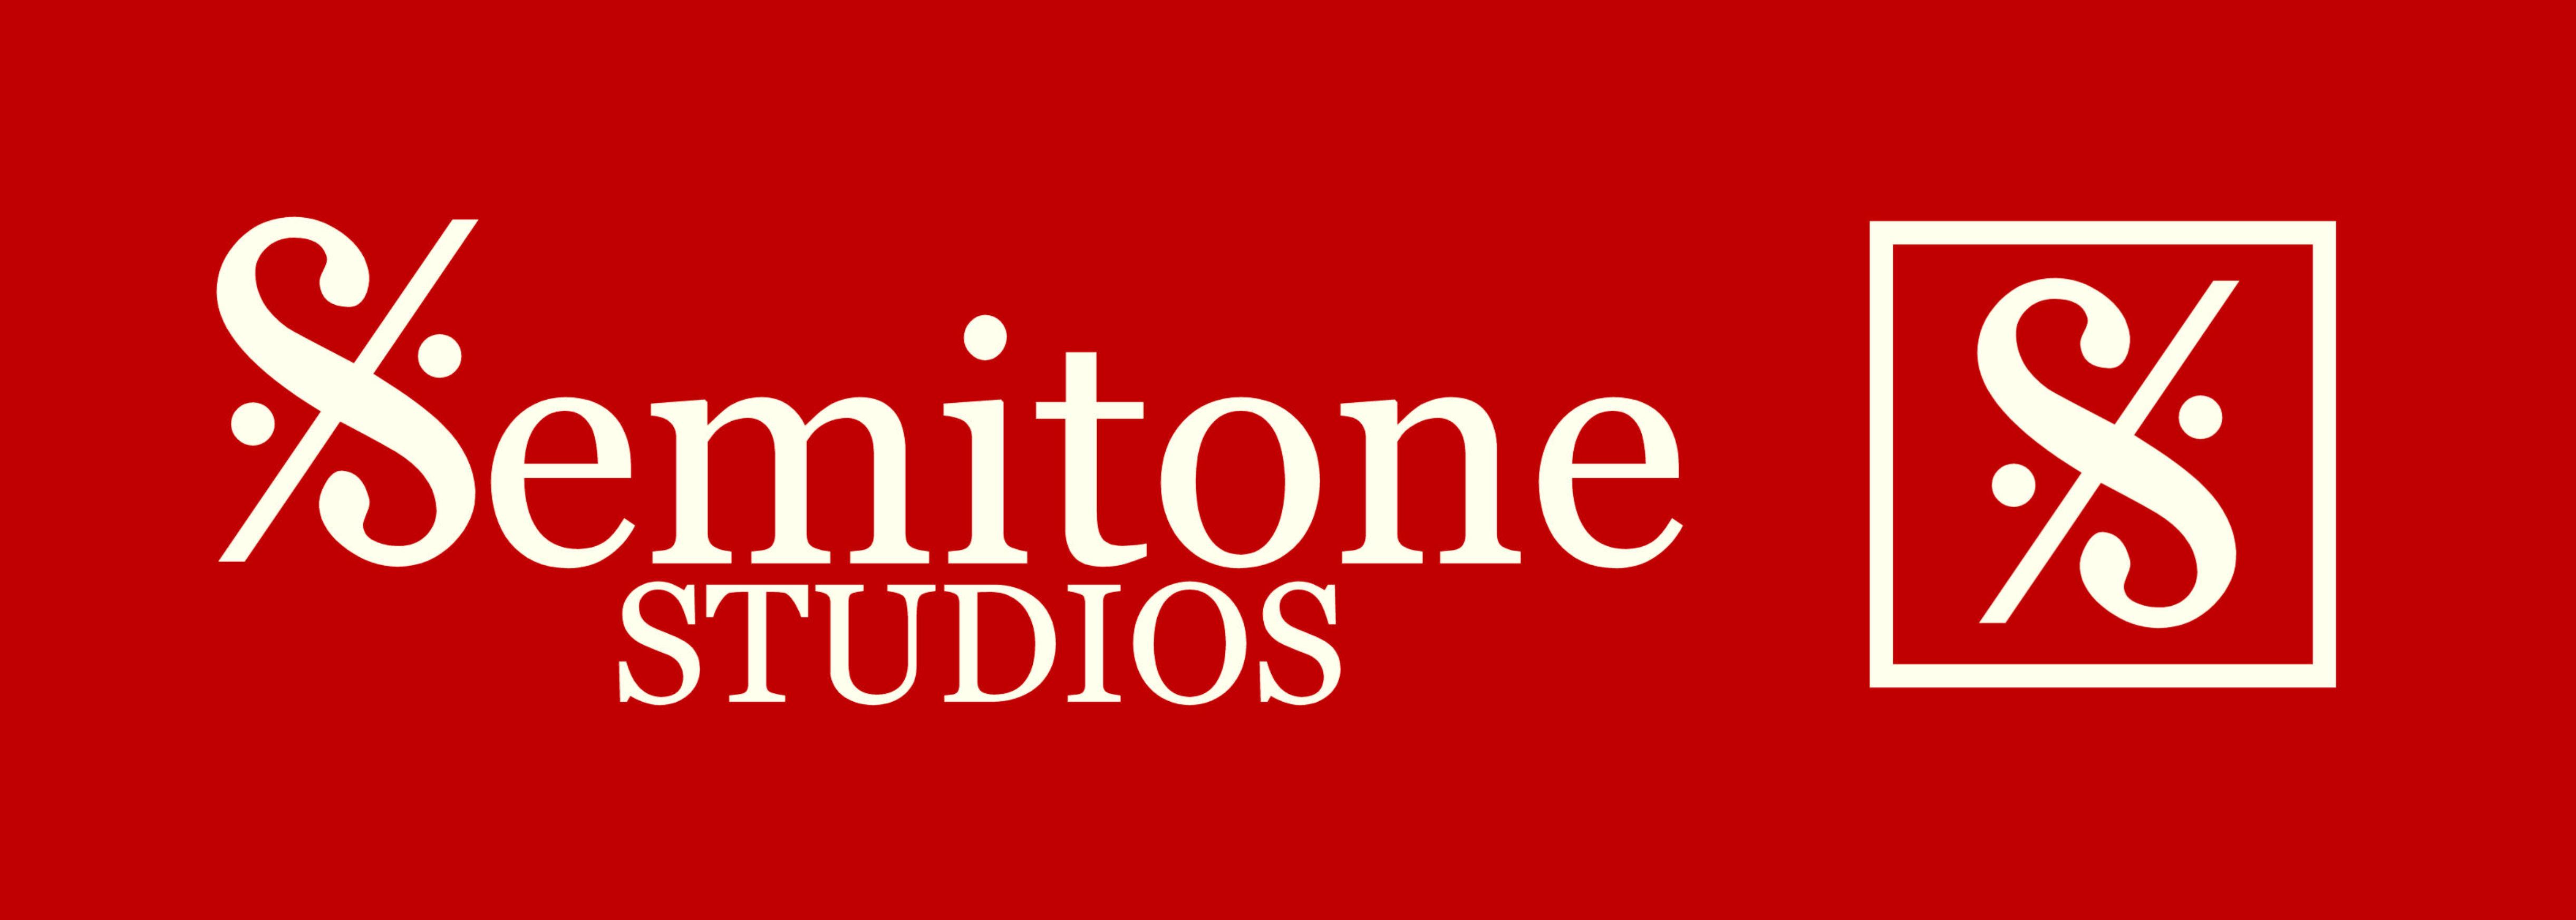 Semitone Studios